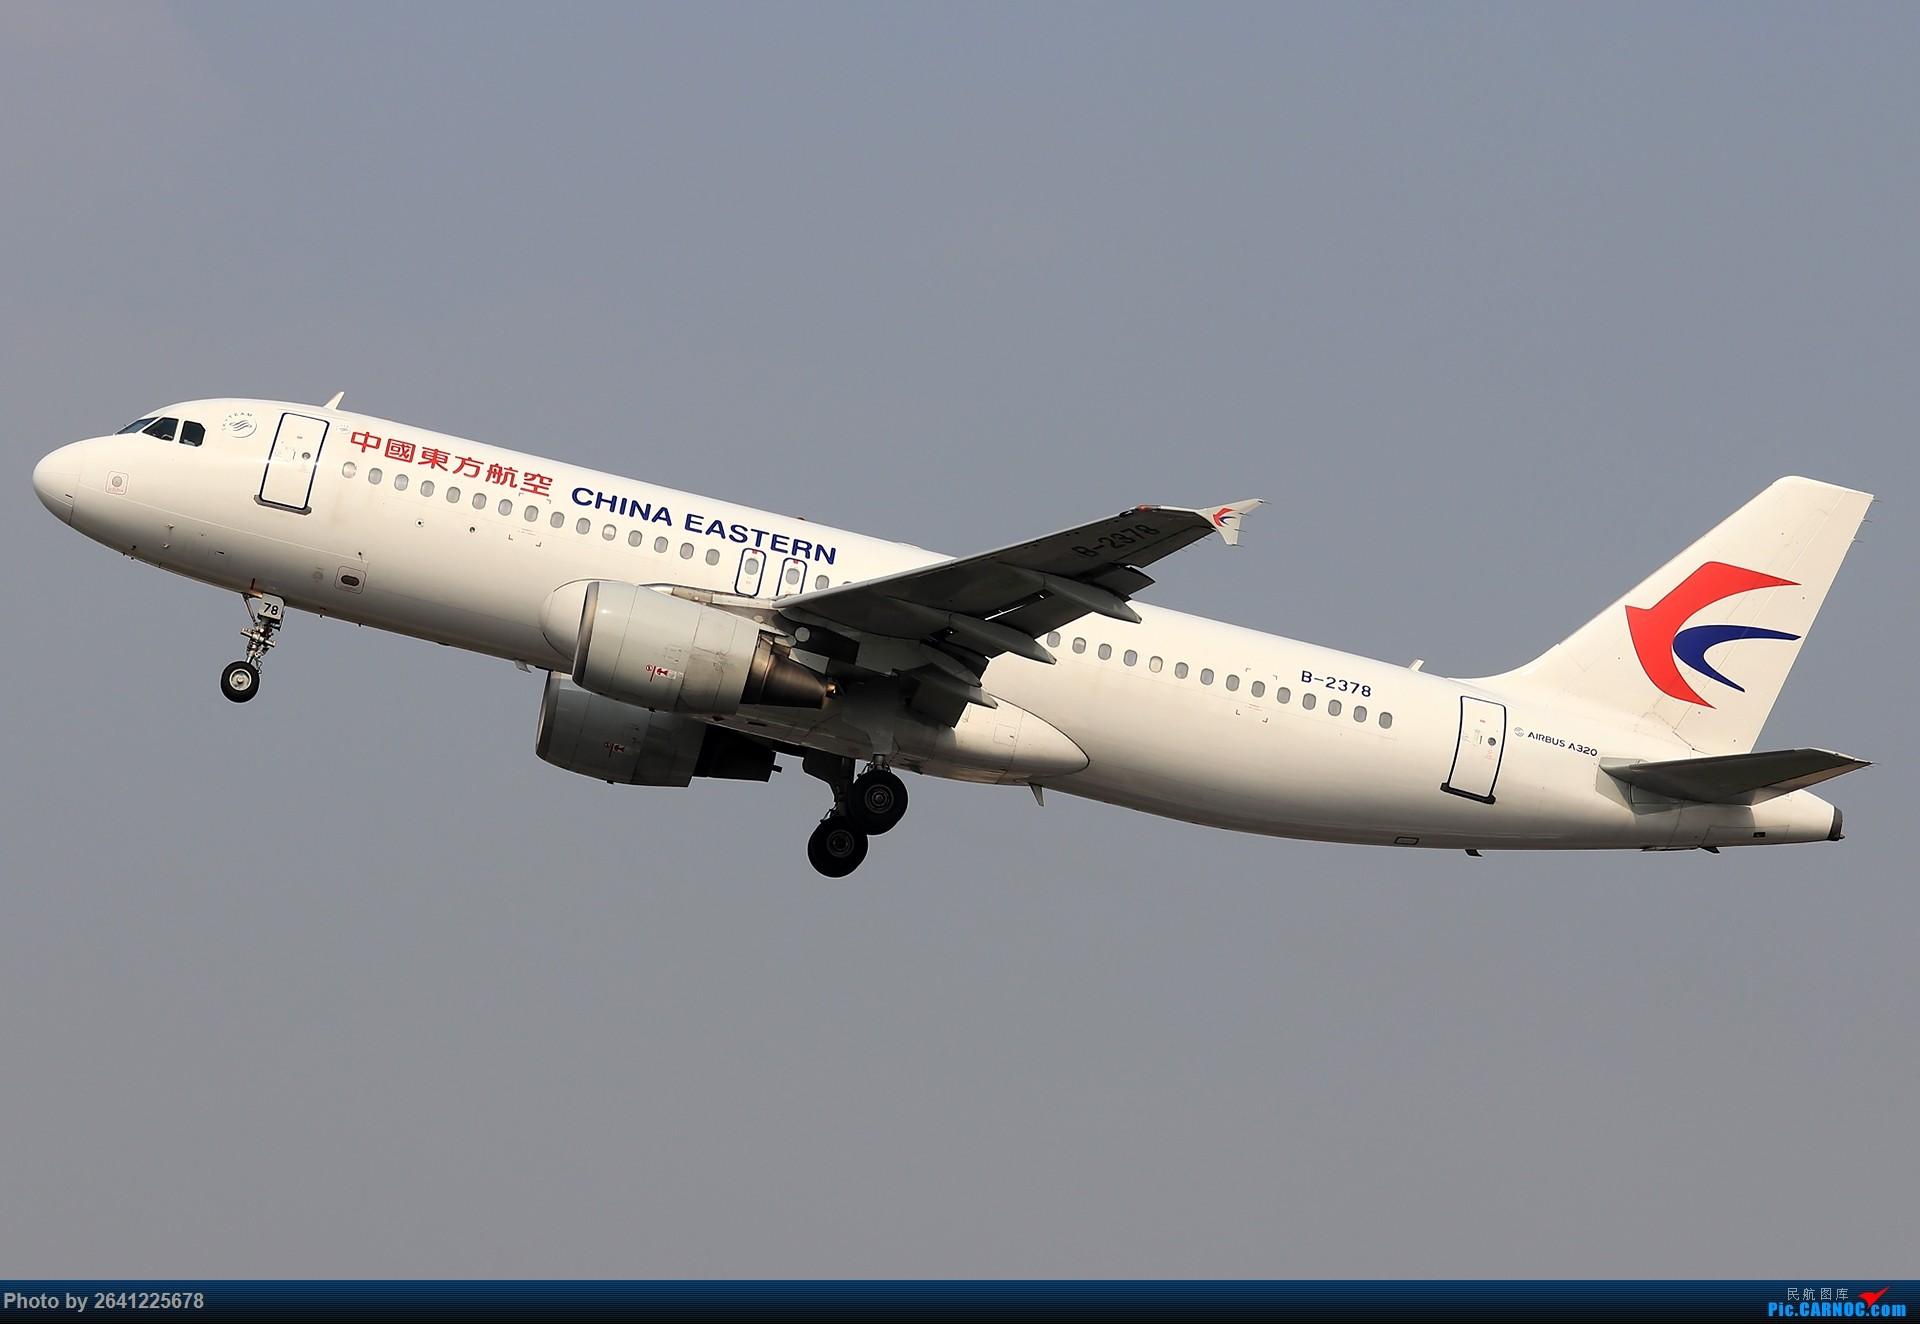 Re:[原创]【TAMRON 156 G2+77D 持续更新中】*****试新机+新镜*****(烂天+地热+渣技术,望大佬多多包涵) AIRBUS A320-200 B-2378 中国北京首都国际机场